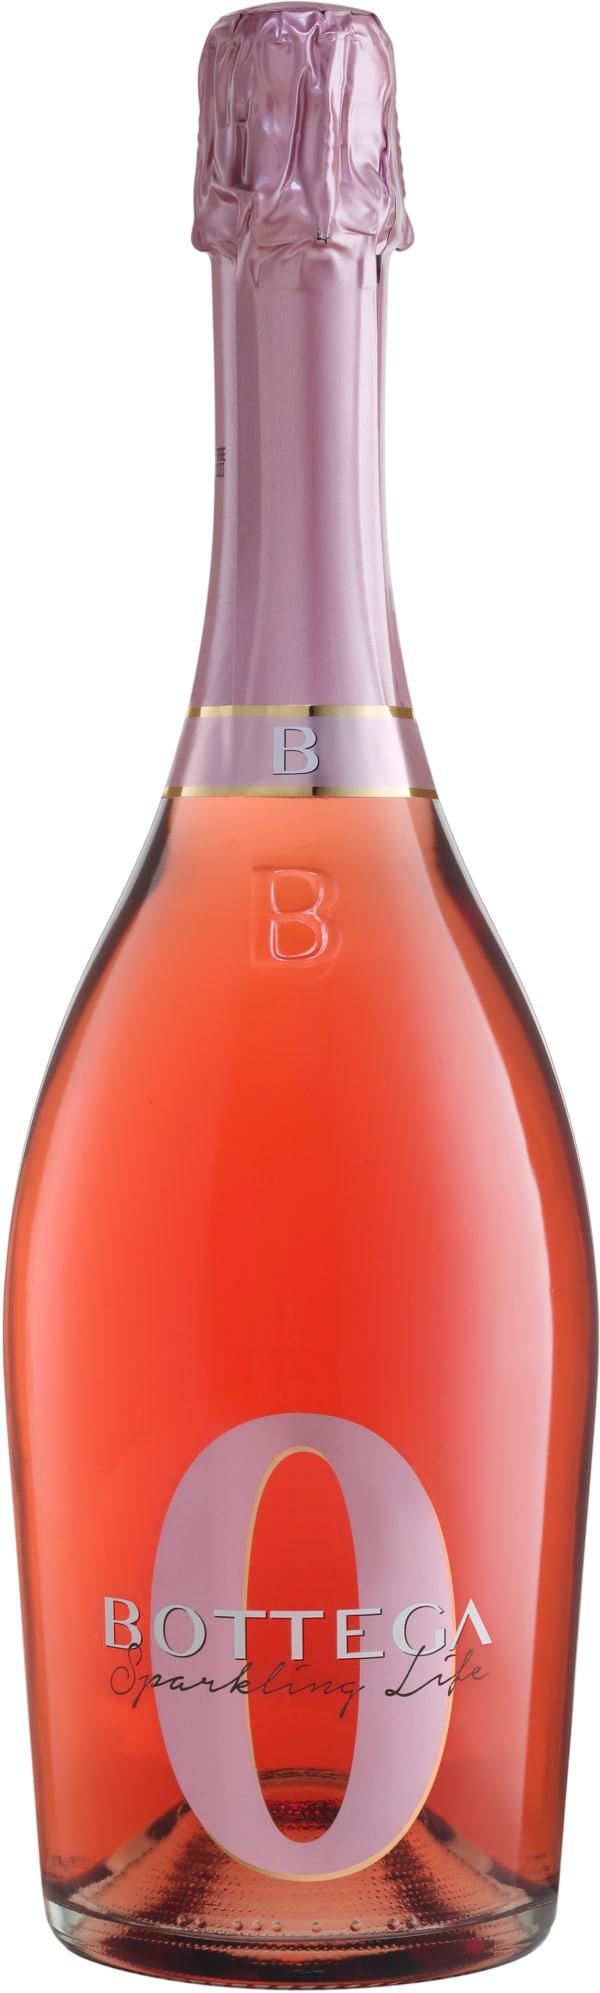 Bottega 0° Rosé